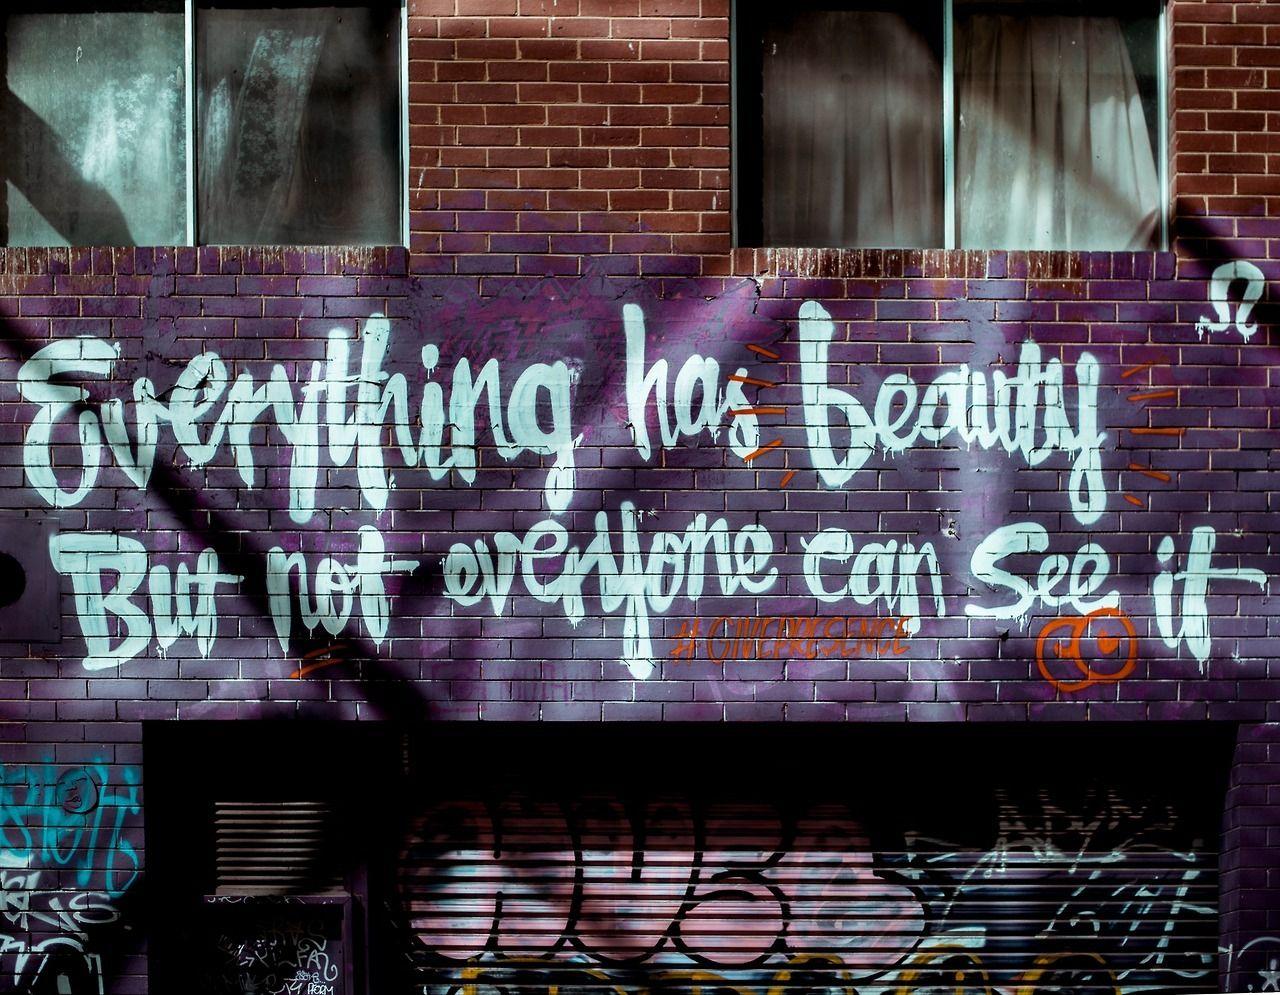 Https Ift Tt 2de6do2 Positive Quotes Stock Images Free Graffiti